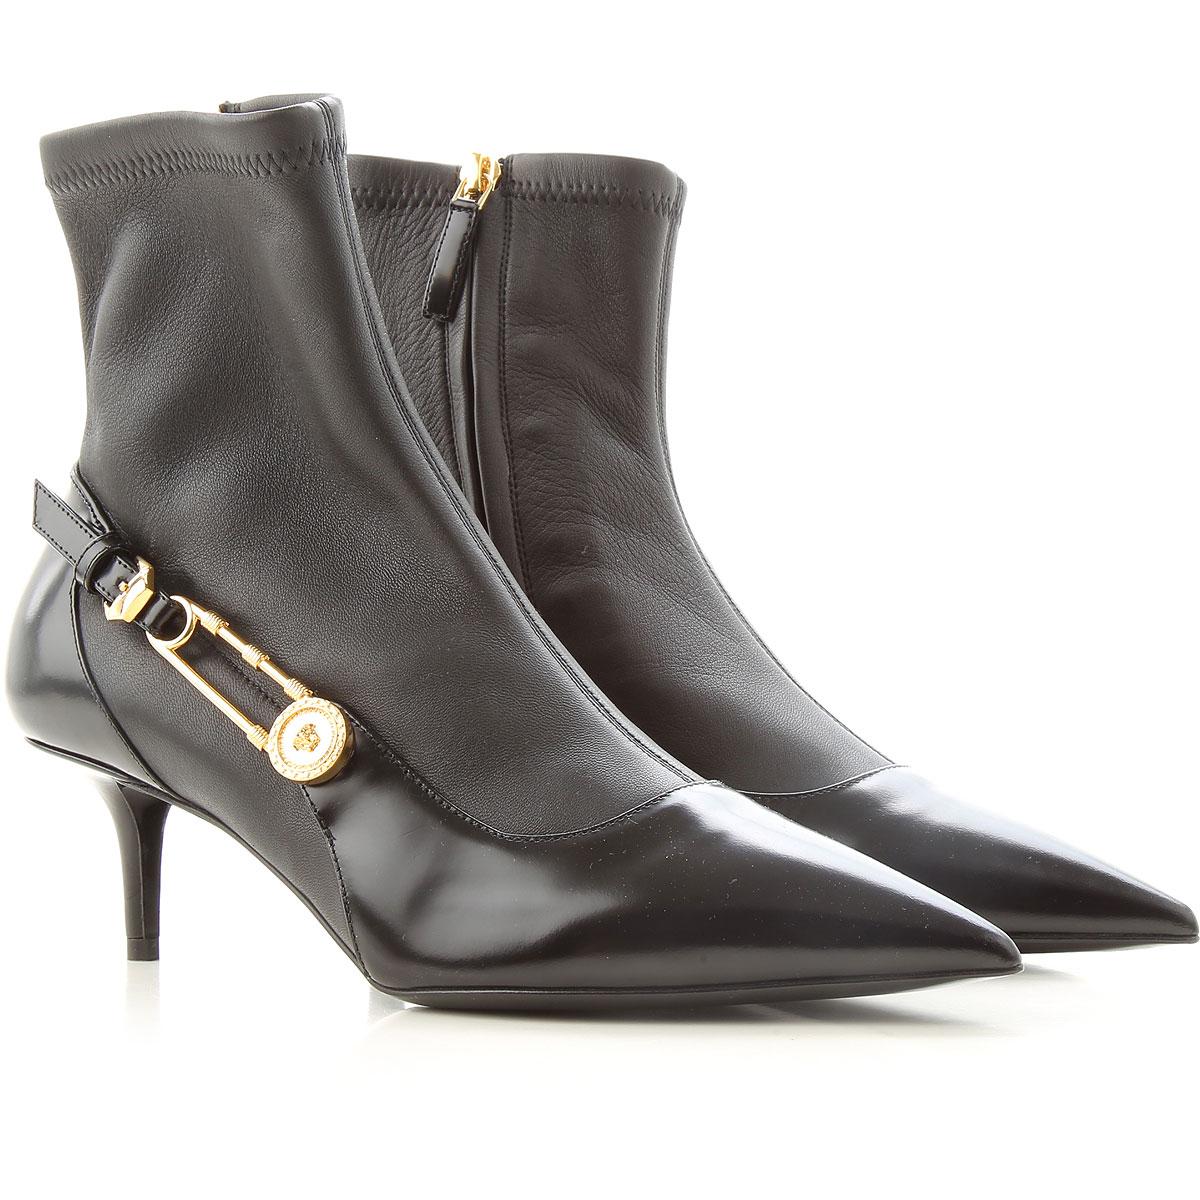 Gianni Versace Boots moterims, Booties, juodi, oda, 2019, 36 37 39 40